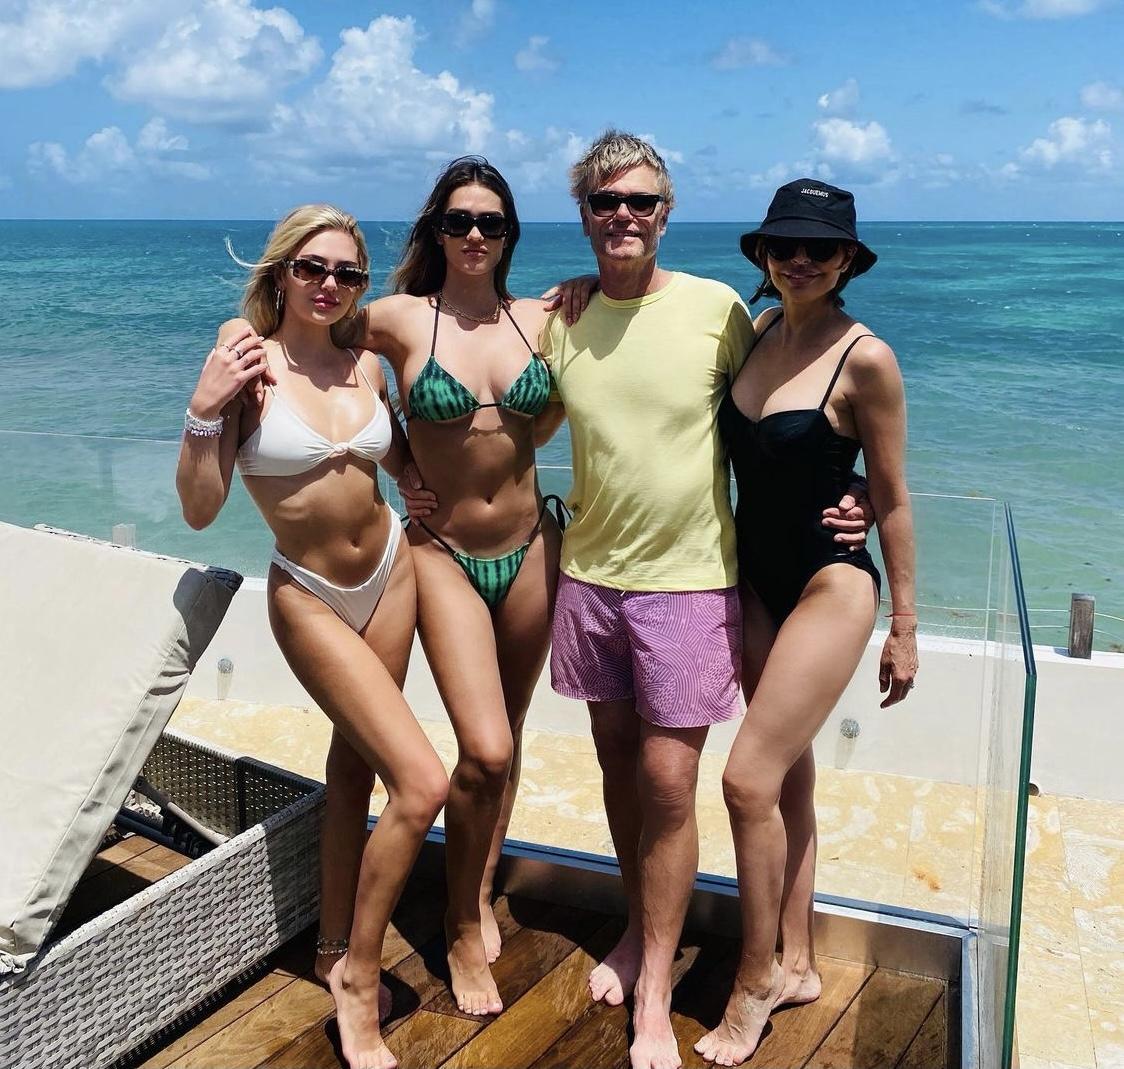 Lisa Rinna Rocks A Bucket Hat With Family On Beach